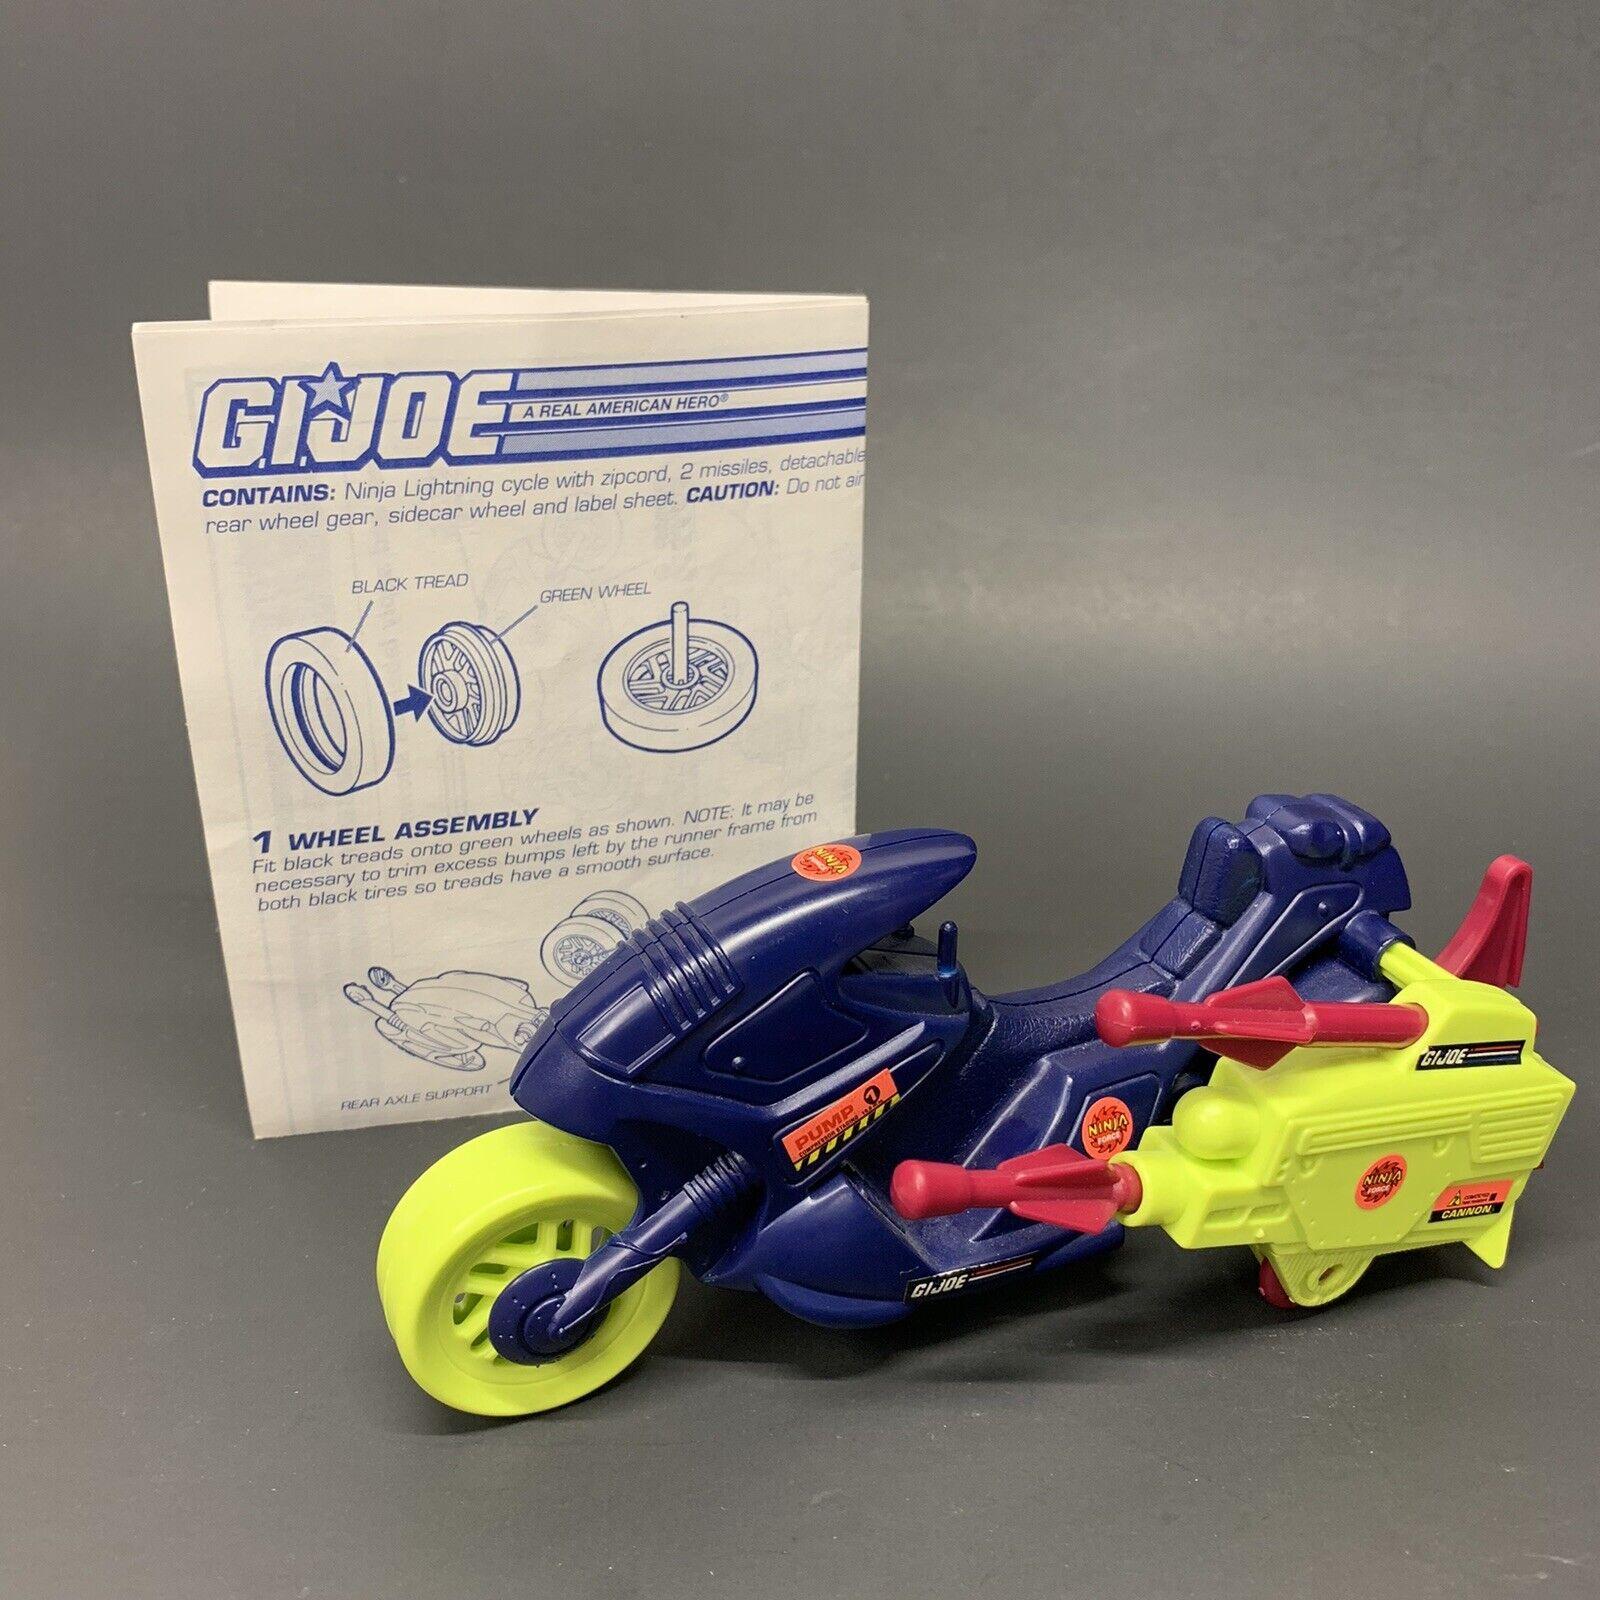 GI Joe Ninja Lightning Motorcycle SIDECAR w// WHEEL Vtg part 1993 accessory g.i